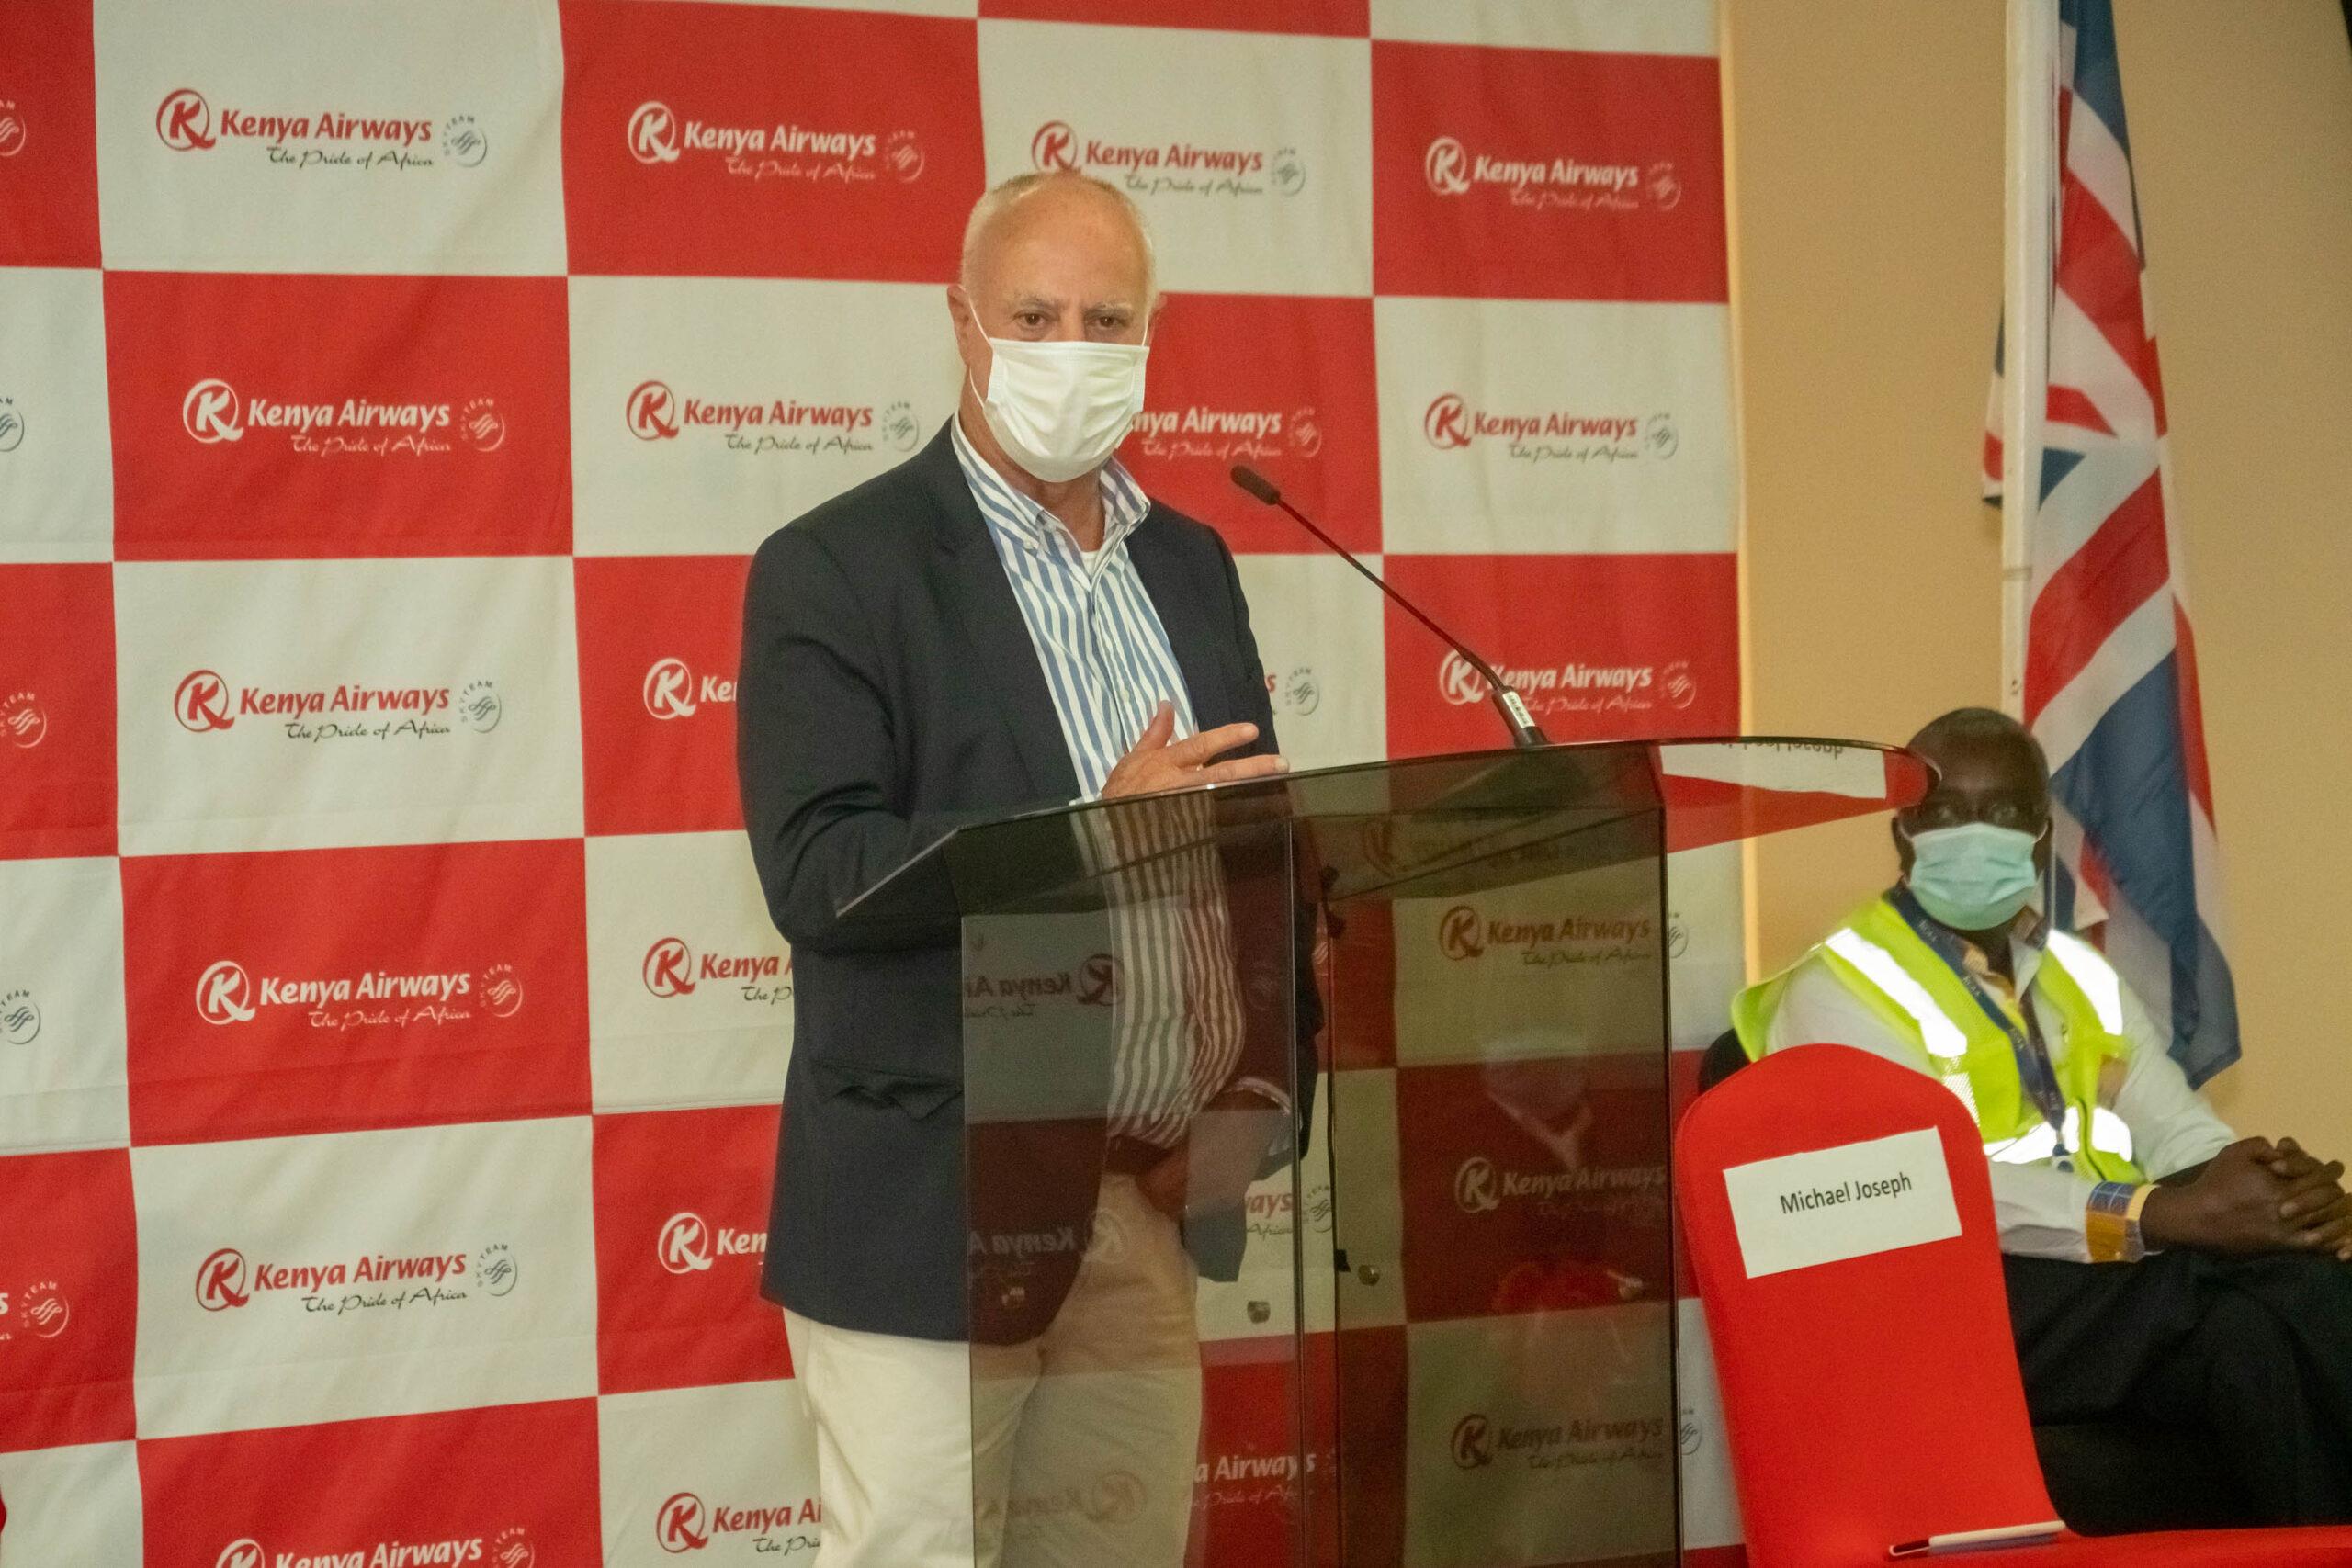 Kenya Airways Chairman of the Board Michael Joseph